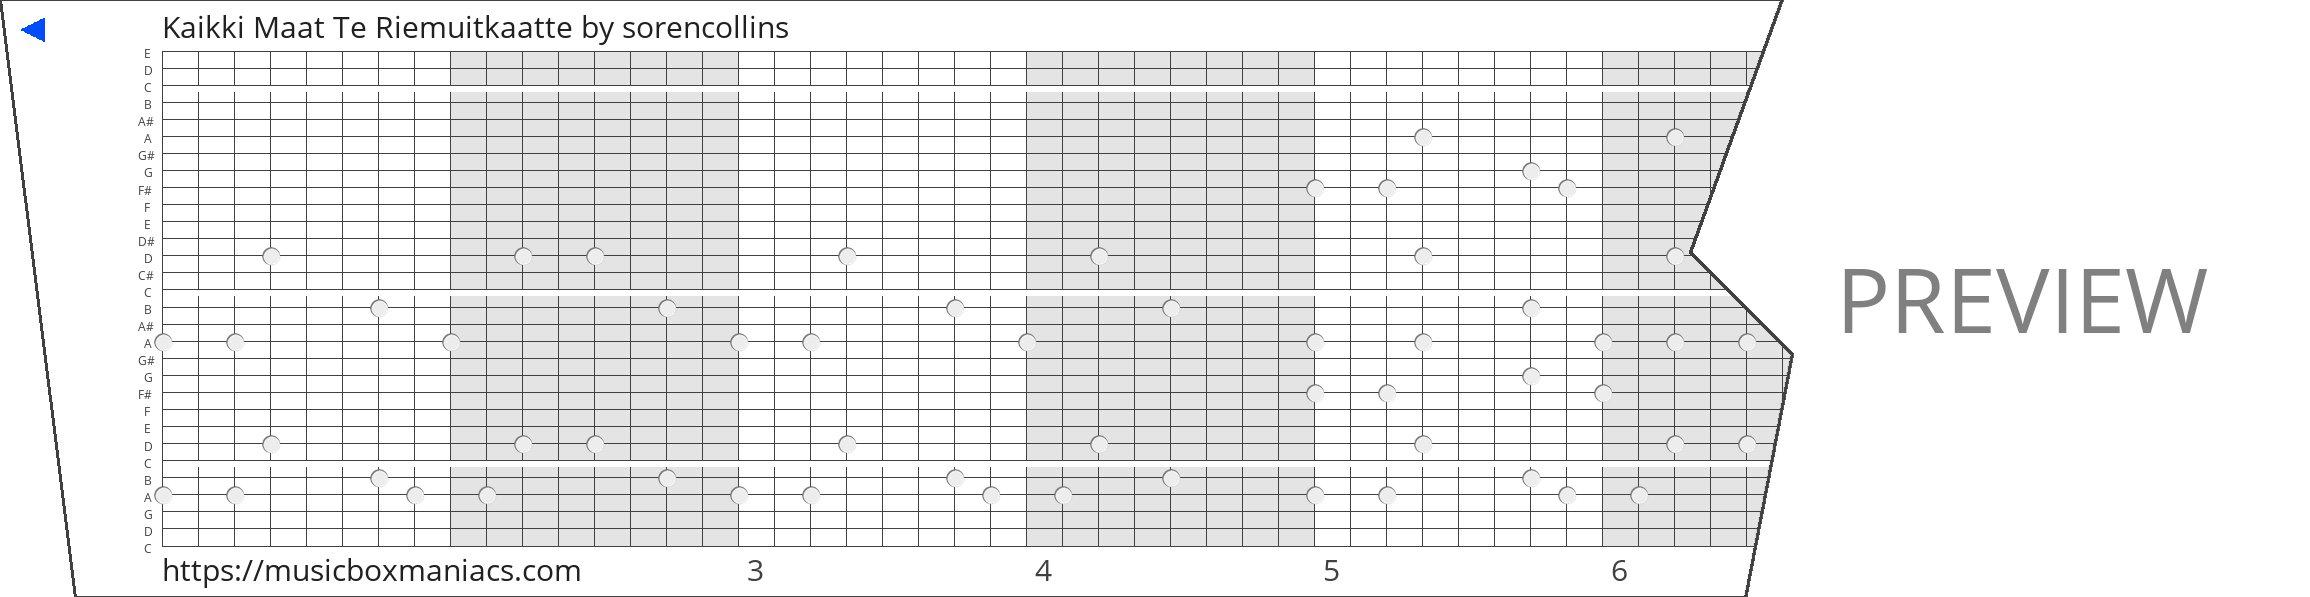 Kaikki Maat Te Riemuitkaatte 30 note music box paper strip